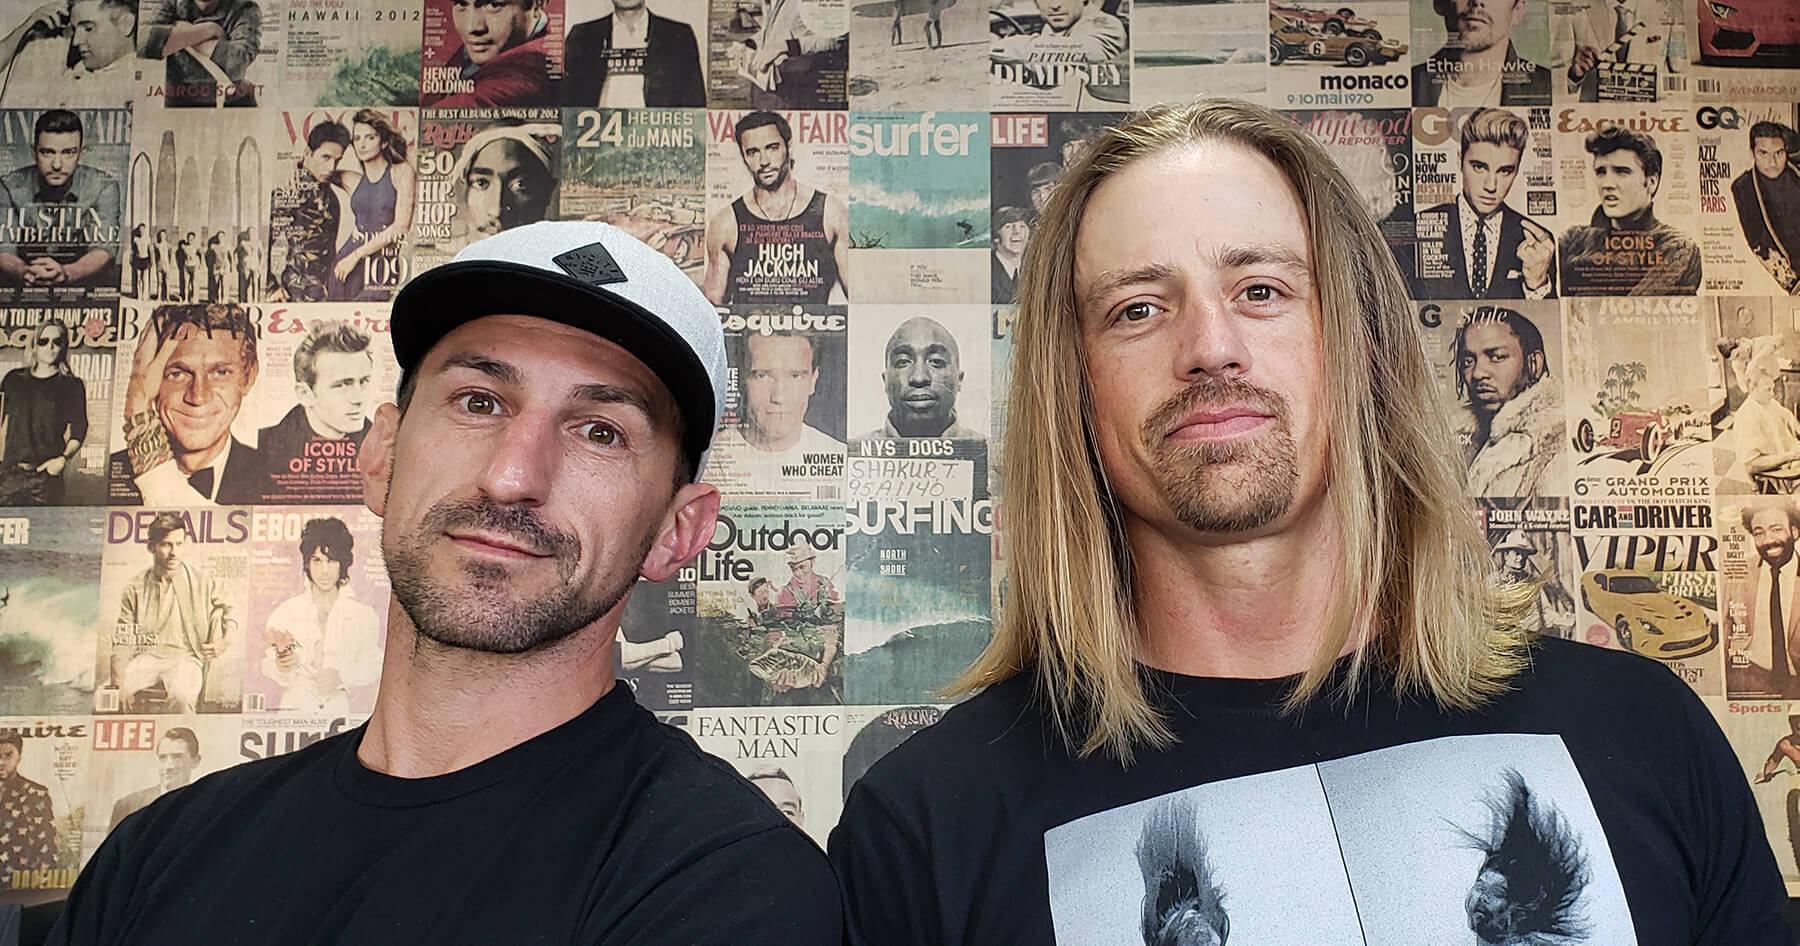 Brightside Barber San Diego, Chris Hjerling